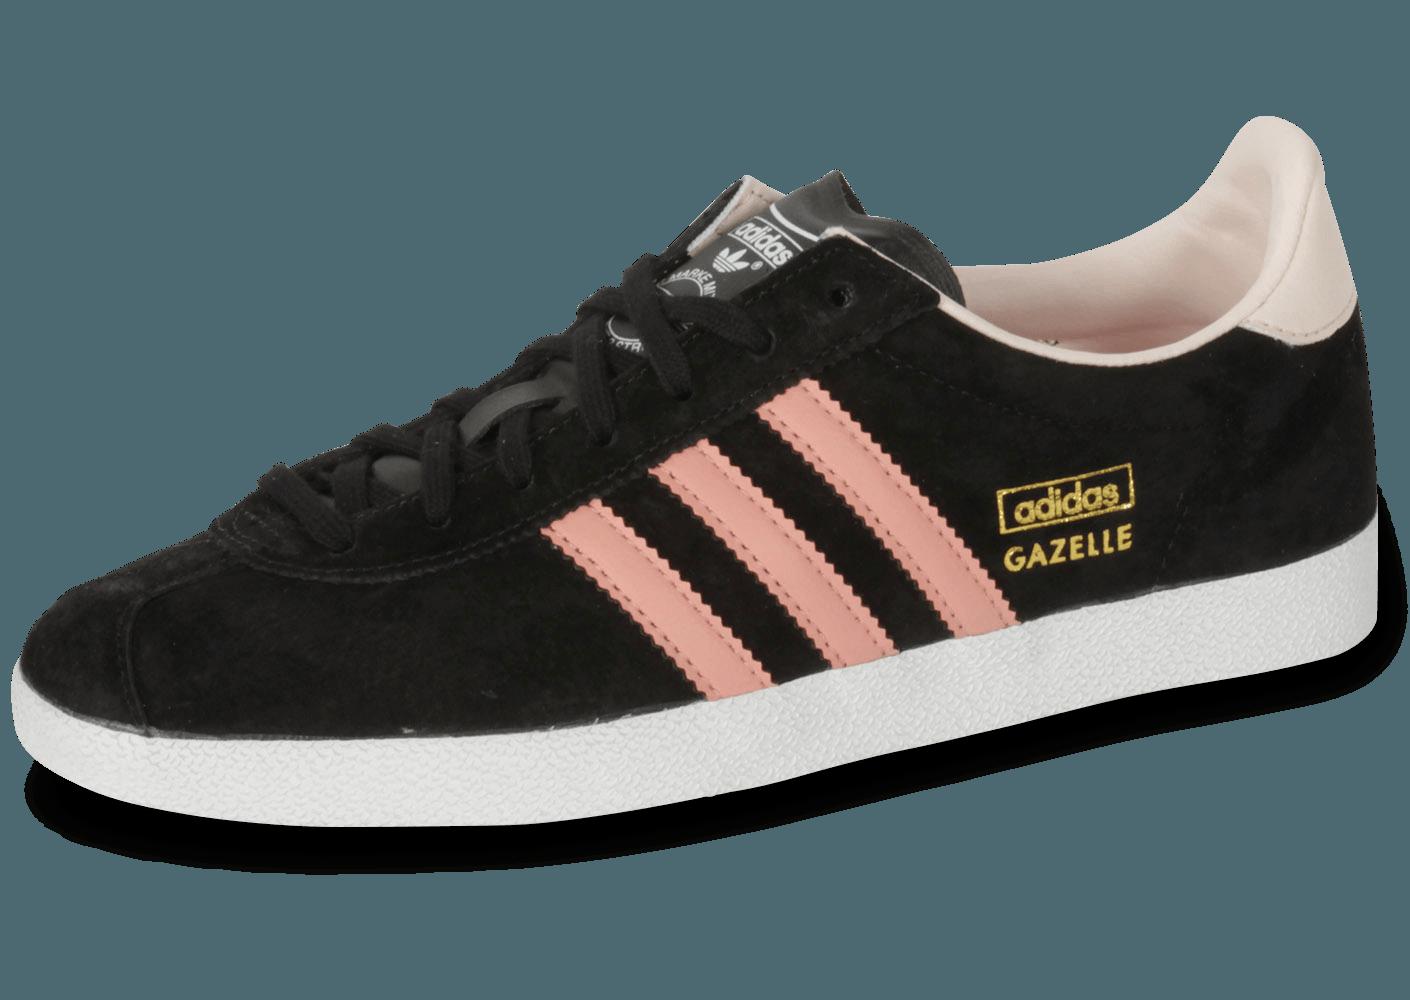 adidas gazelle femme noir et rose